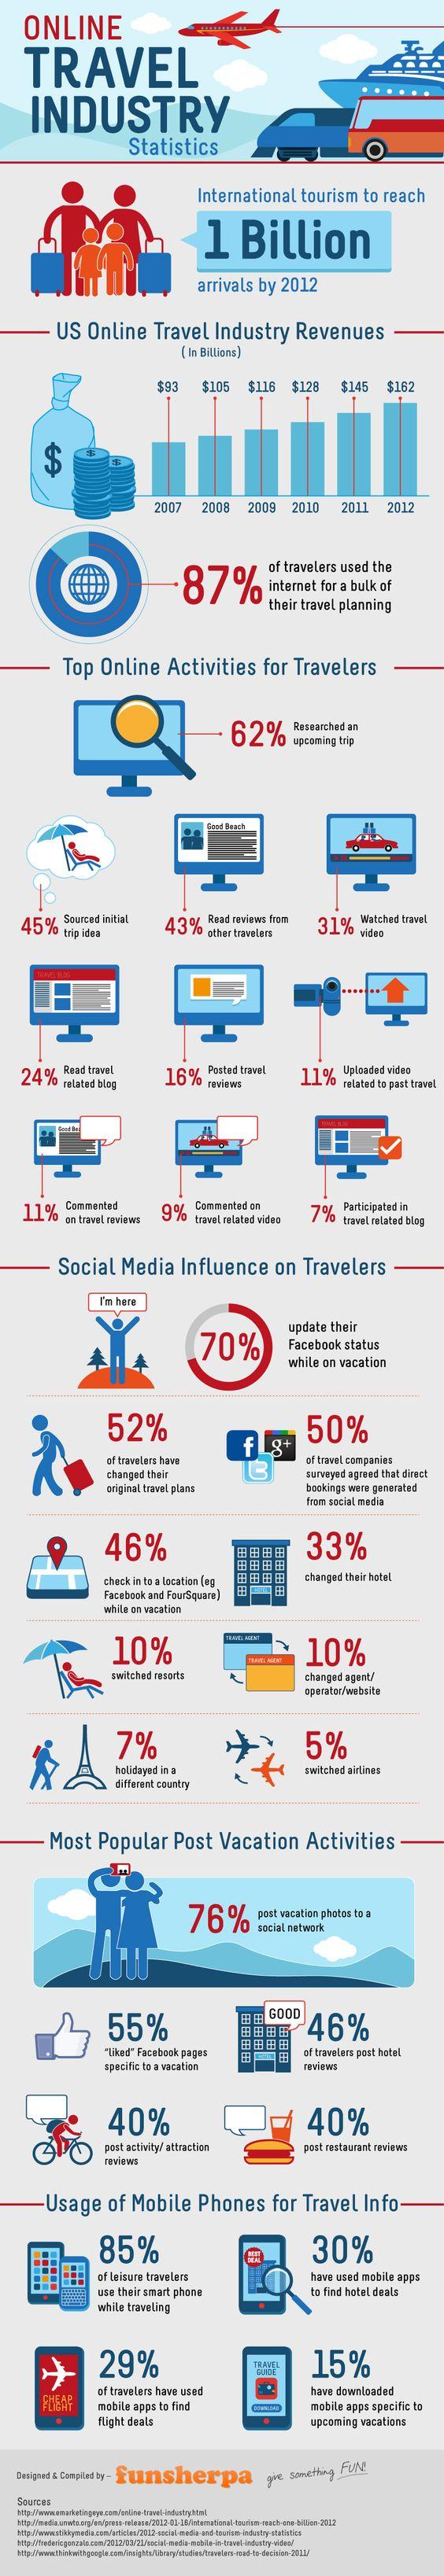 online-travel-industry.jpeg (843×4896)